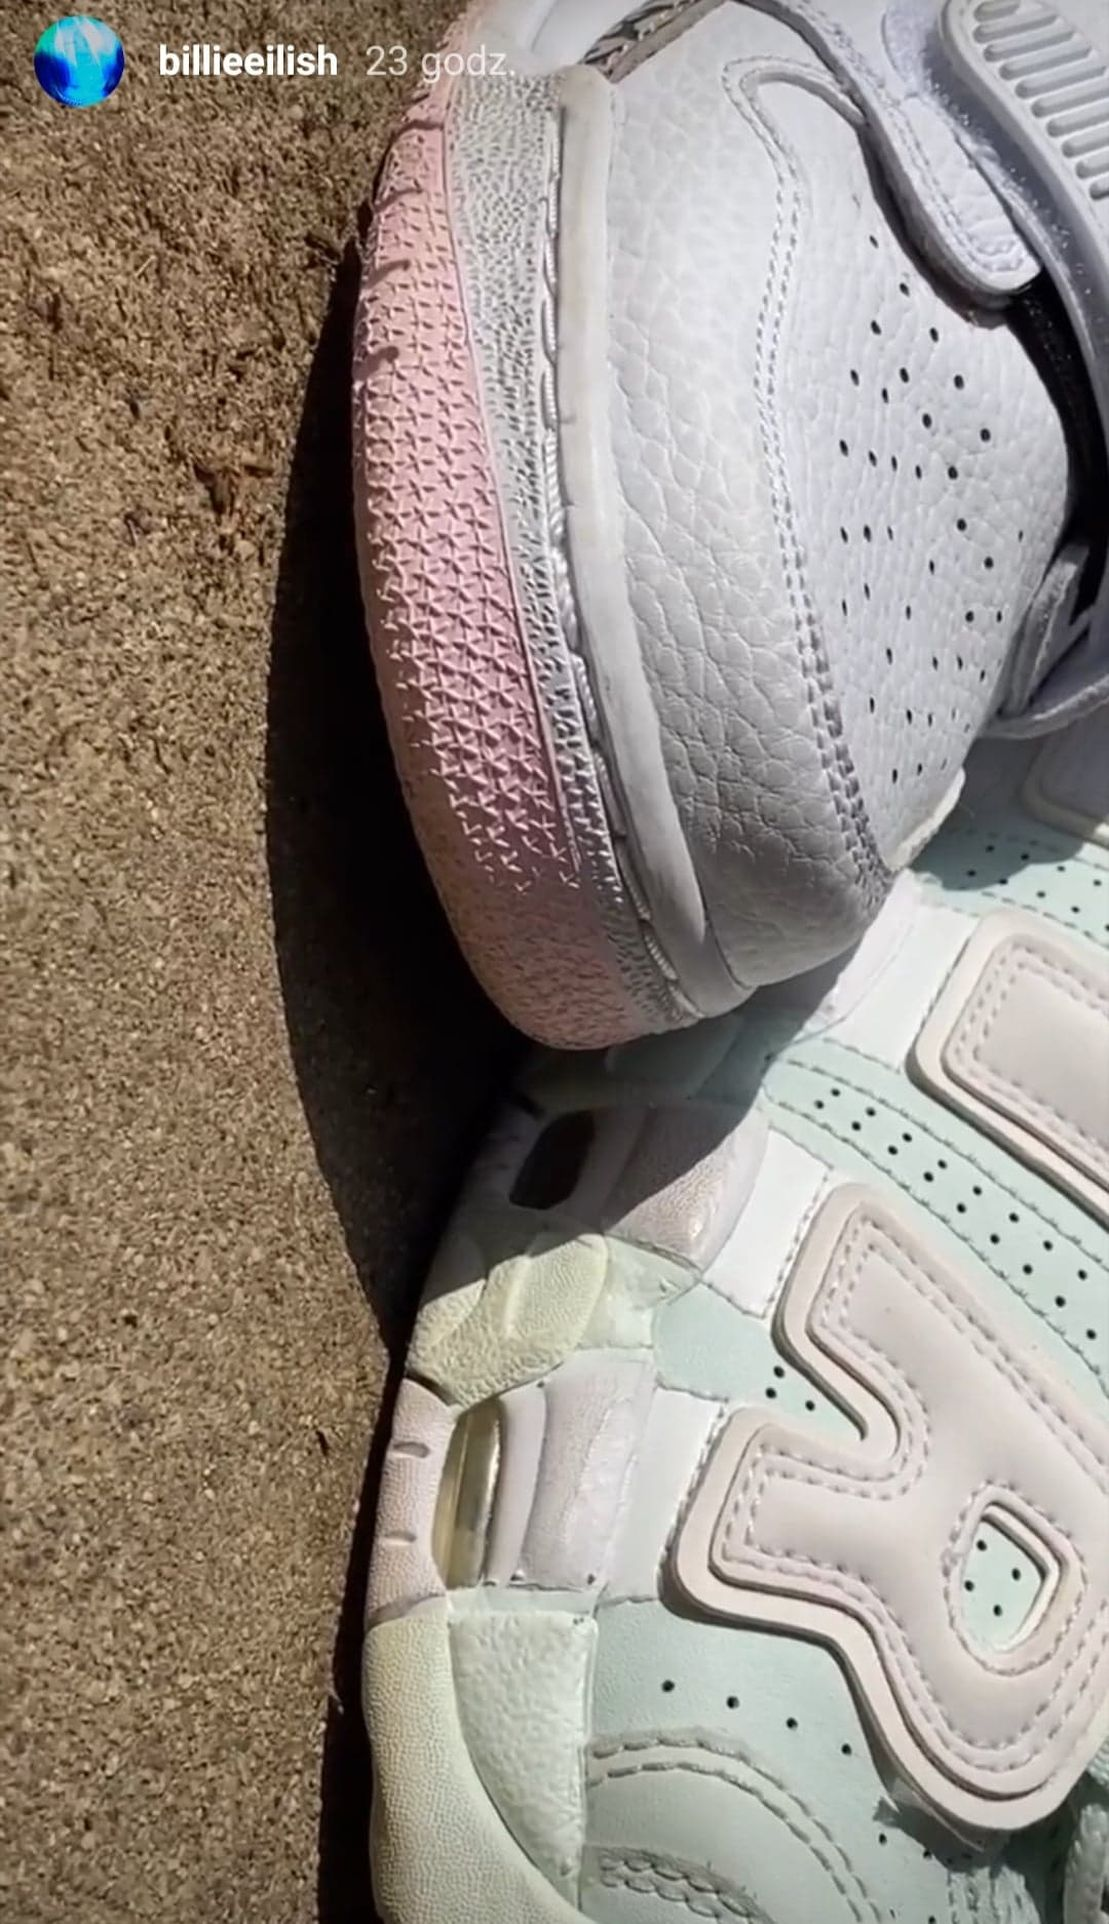 Jaki kolor mają buty Billie Eilish